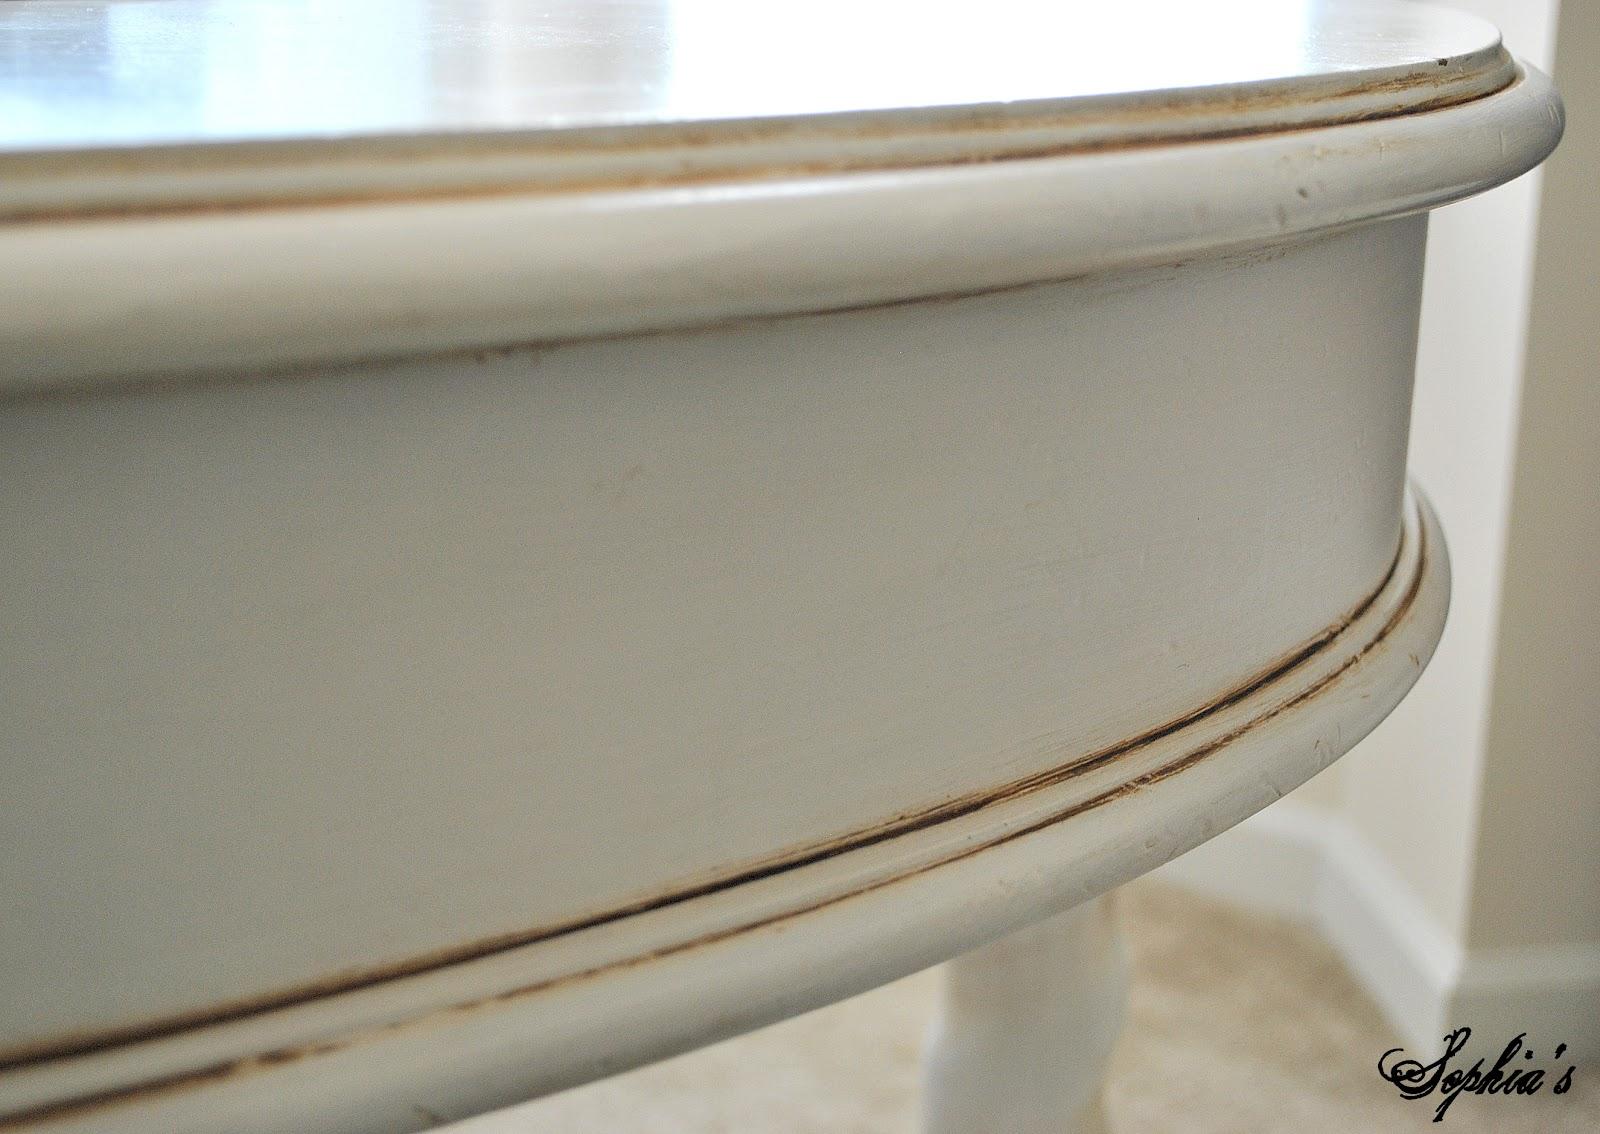 Sophia s Glaze Craze Tips for Glazing Furniture